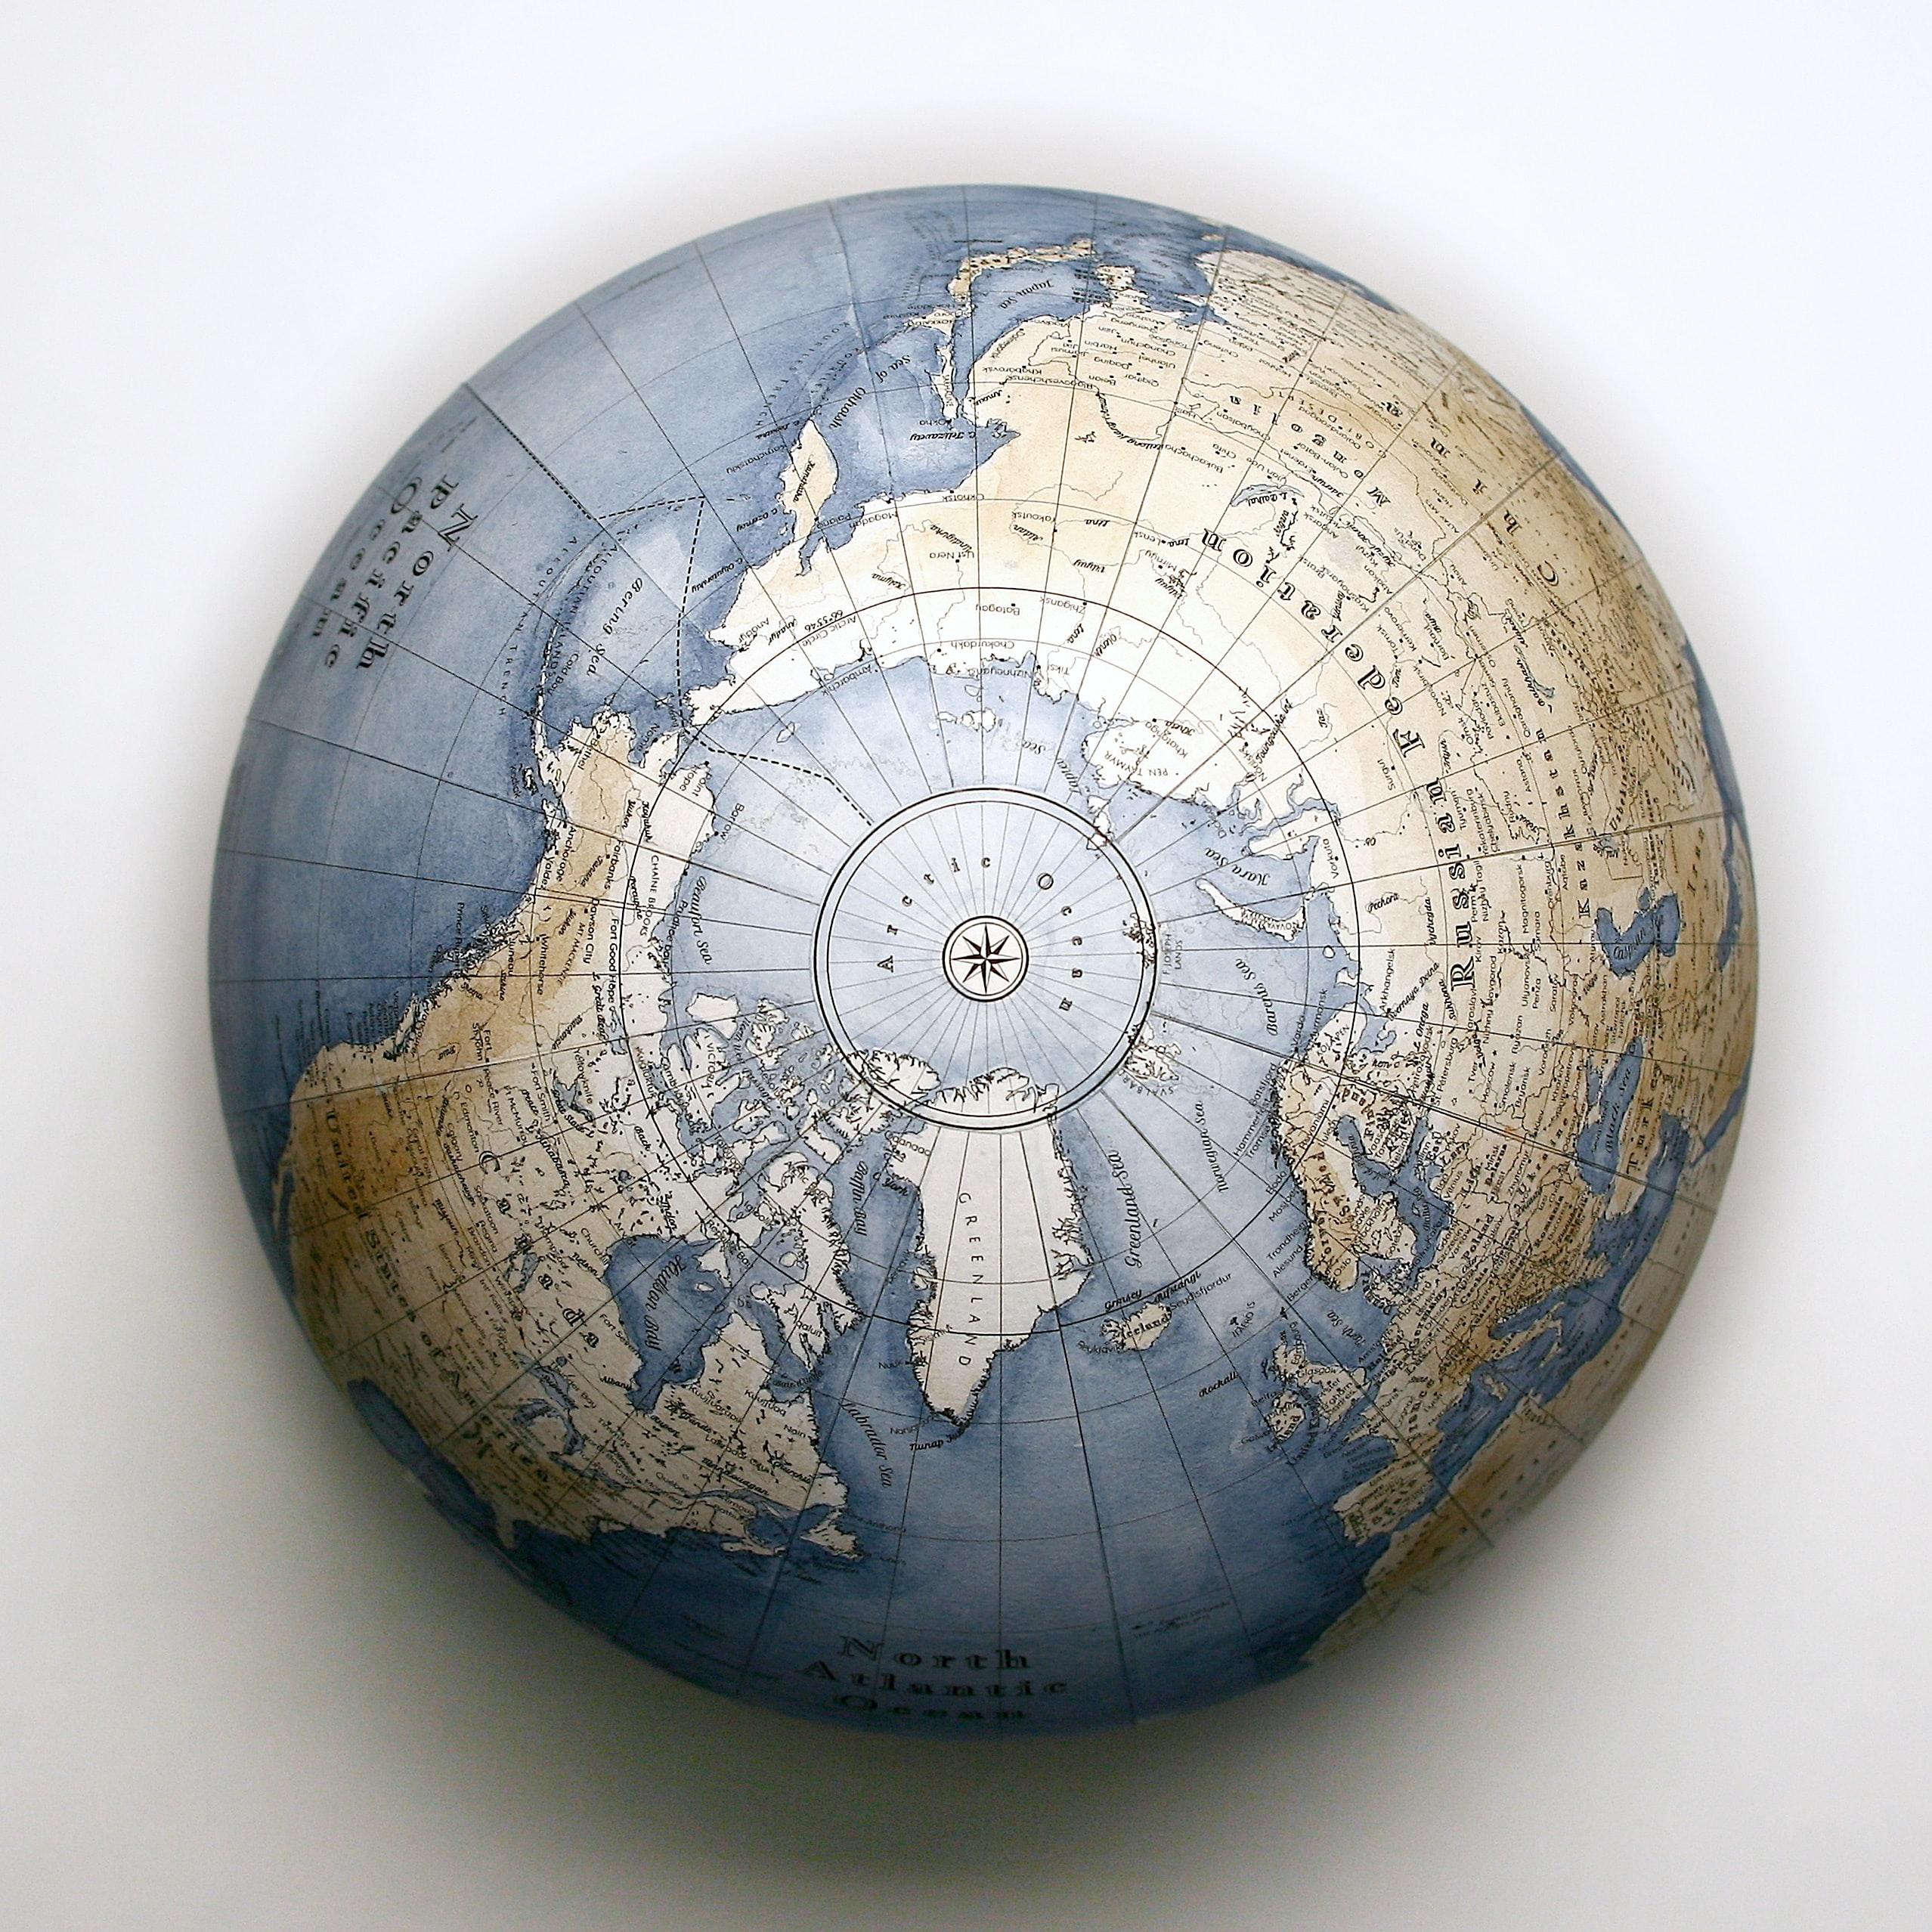 Birds eye view of a globe